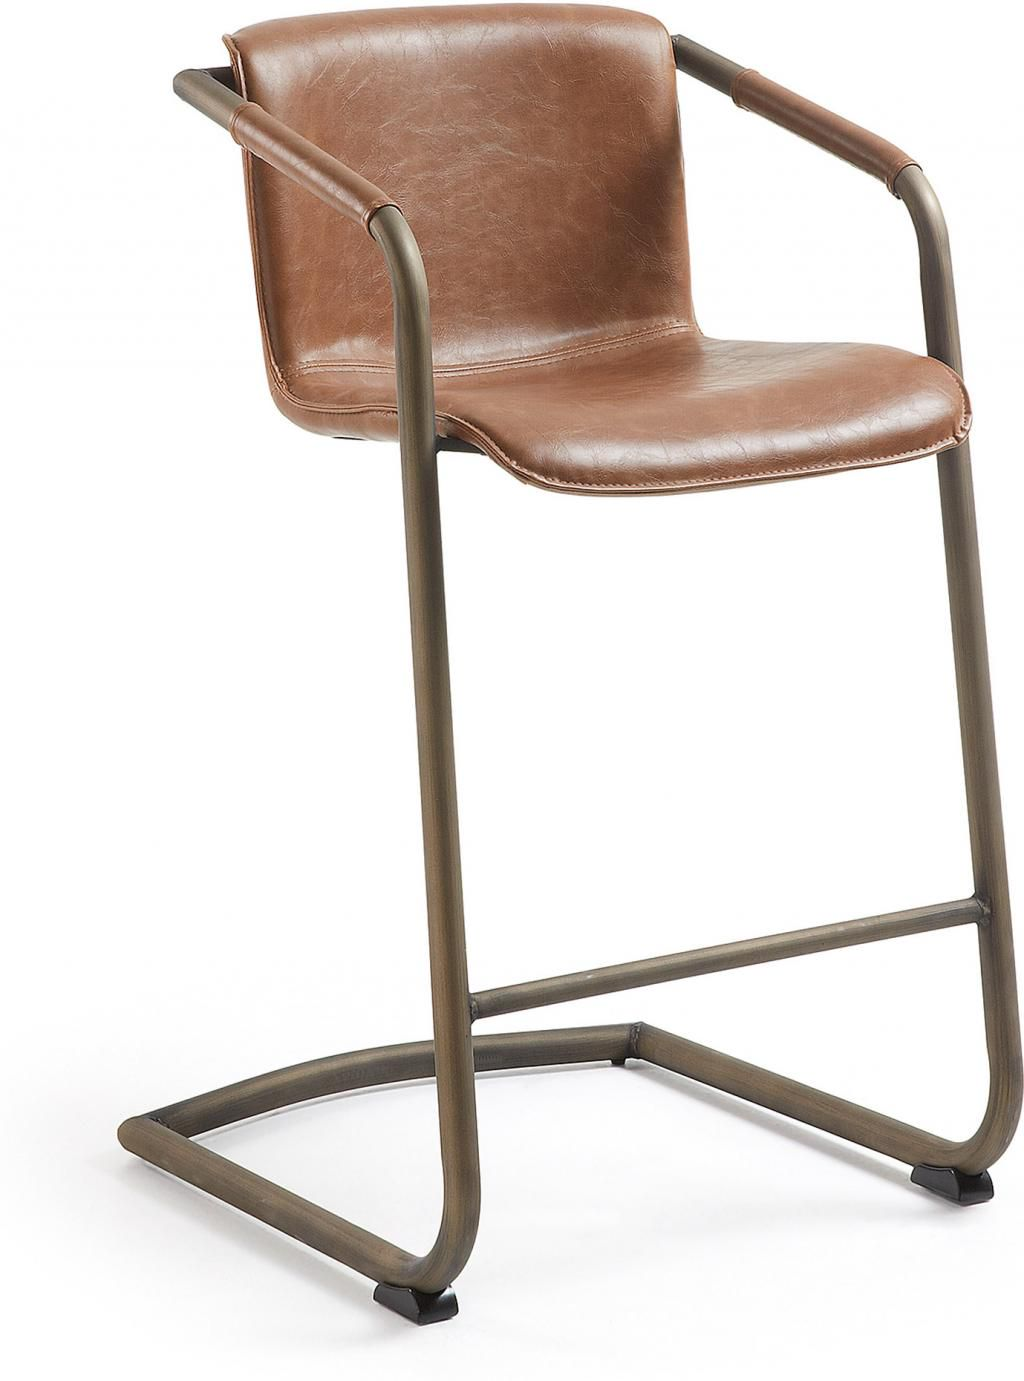 laforma barhocker trion braun pu leder oxidiertes metall h89cm la forma. Black Bedroom Furniture Sets. Home Design Ideas